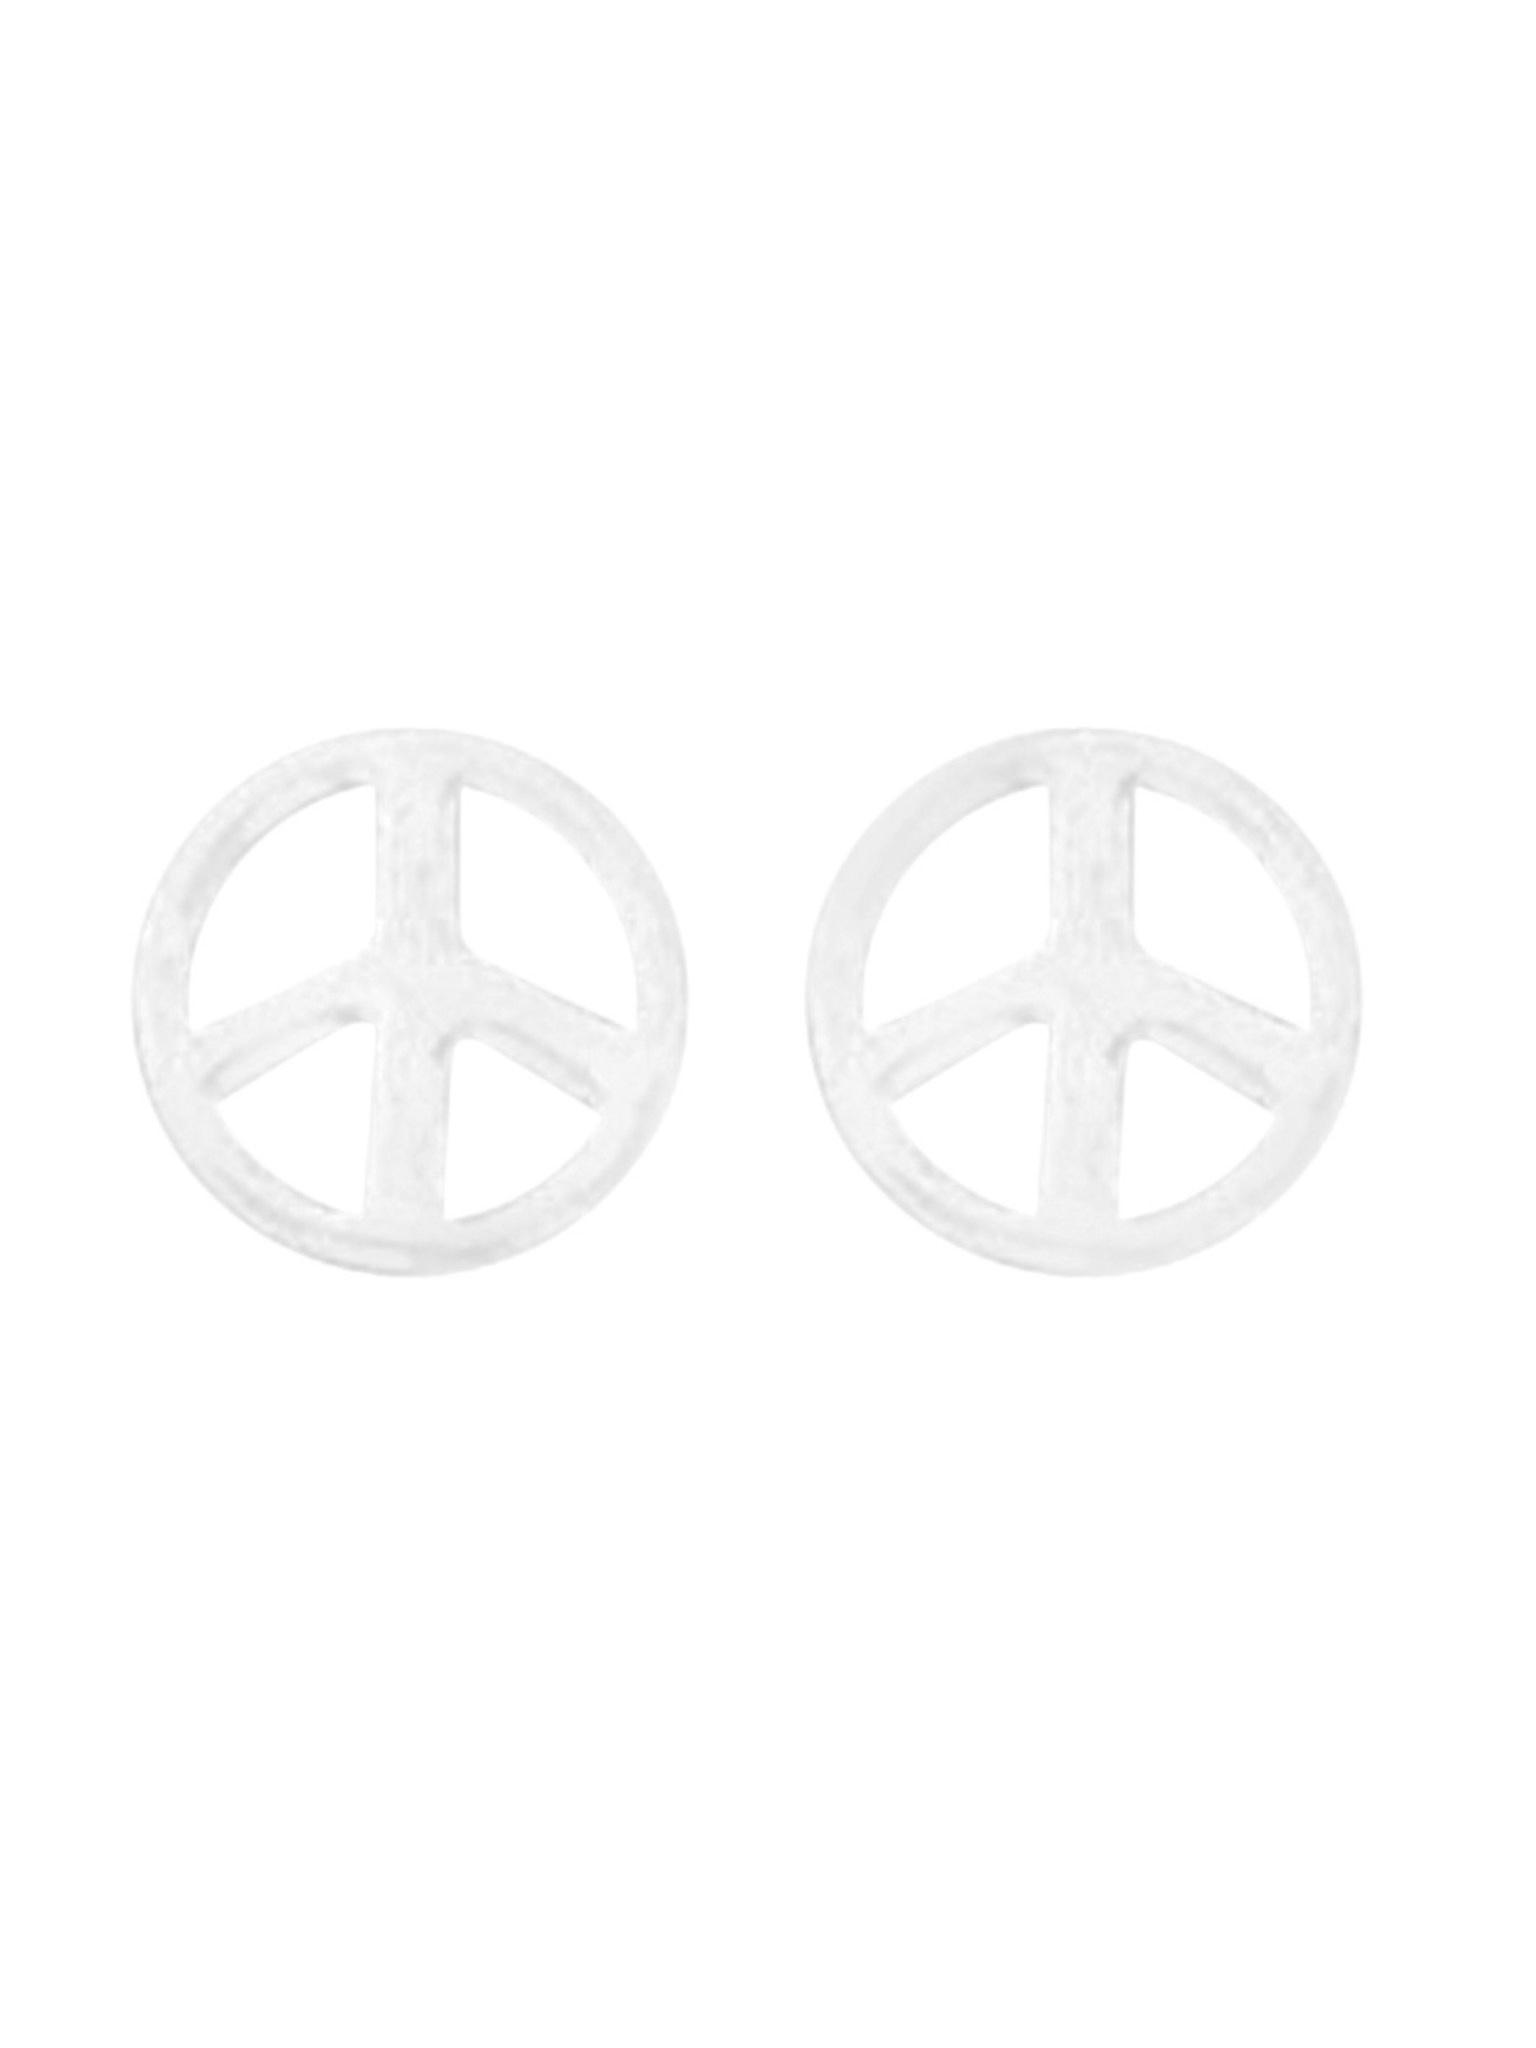 Acomo Jewelry Peace Sign Stud Earring